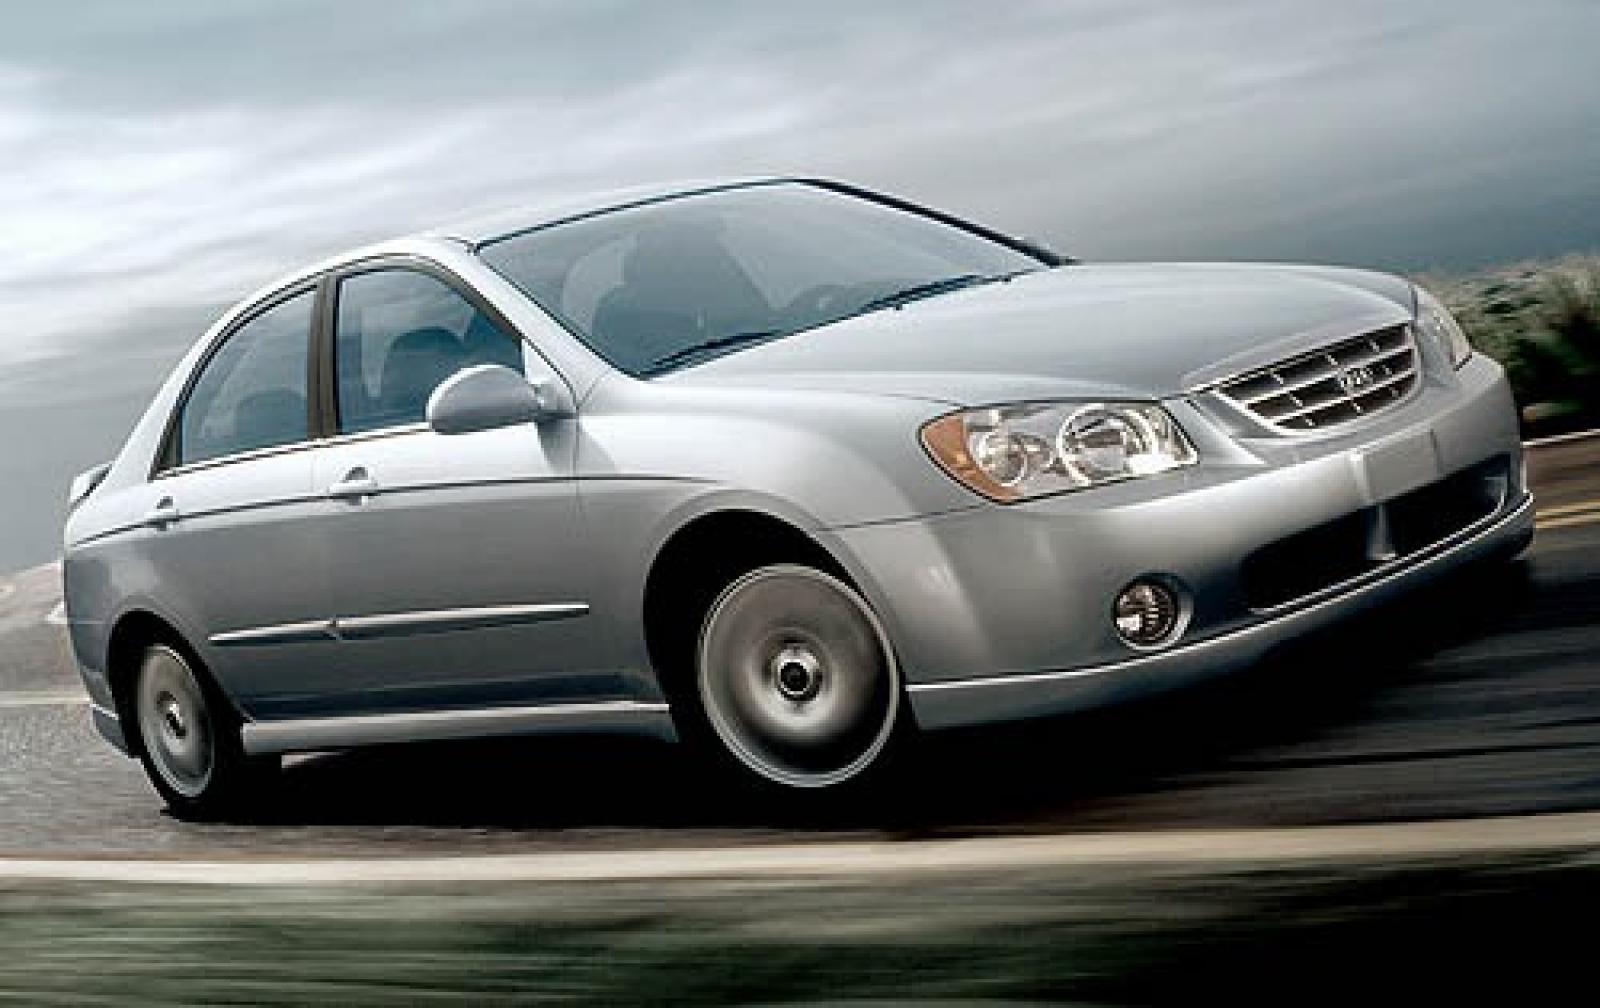 Kia Spectra I Restyling 2 2004 - 2011 Sedan #2